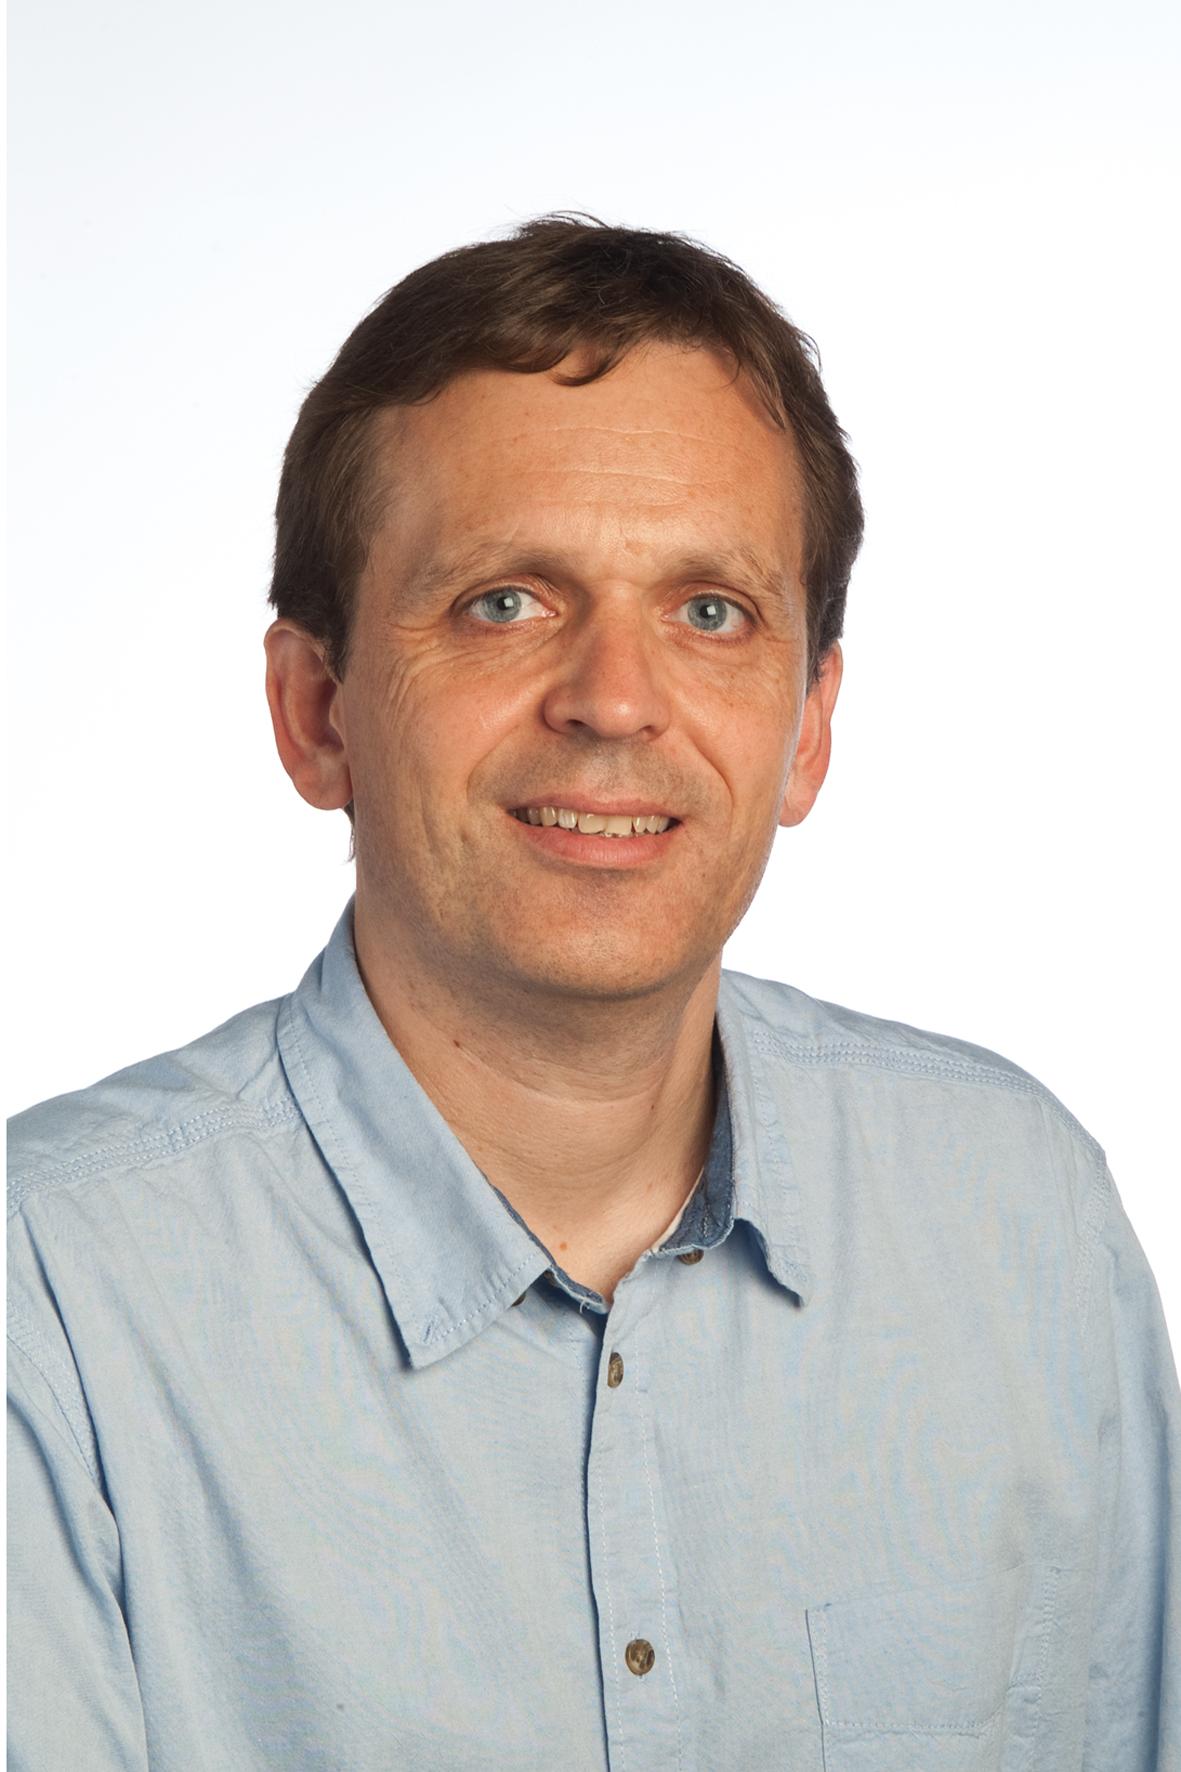 Jan Alsner